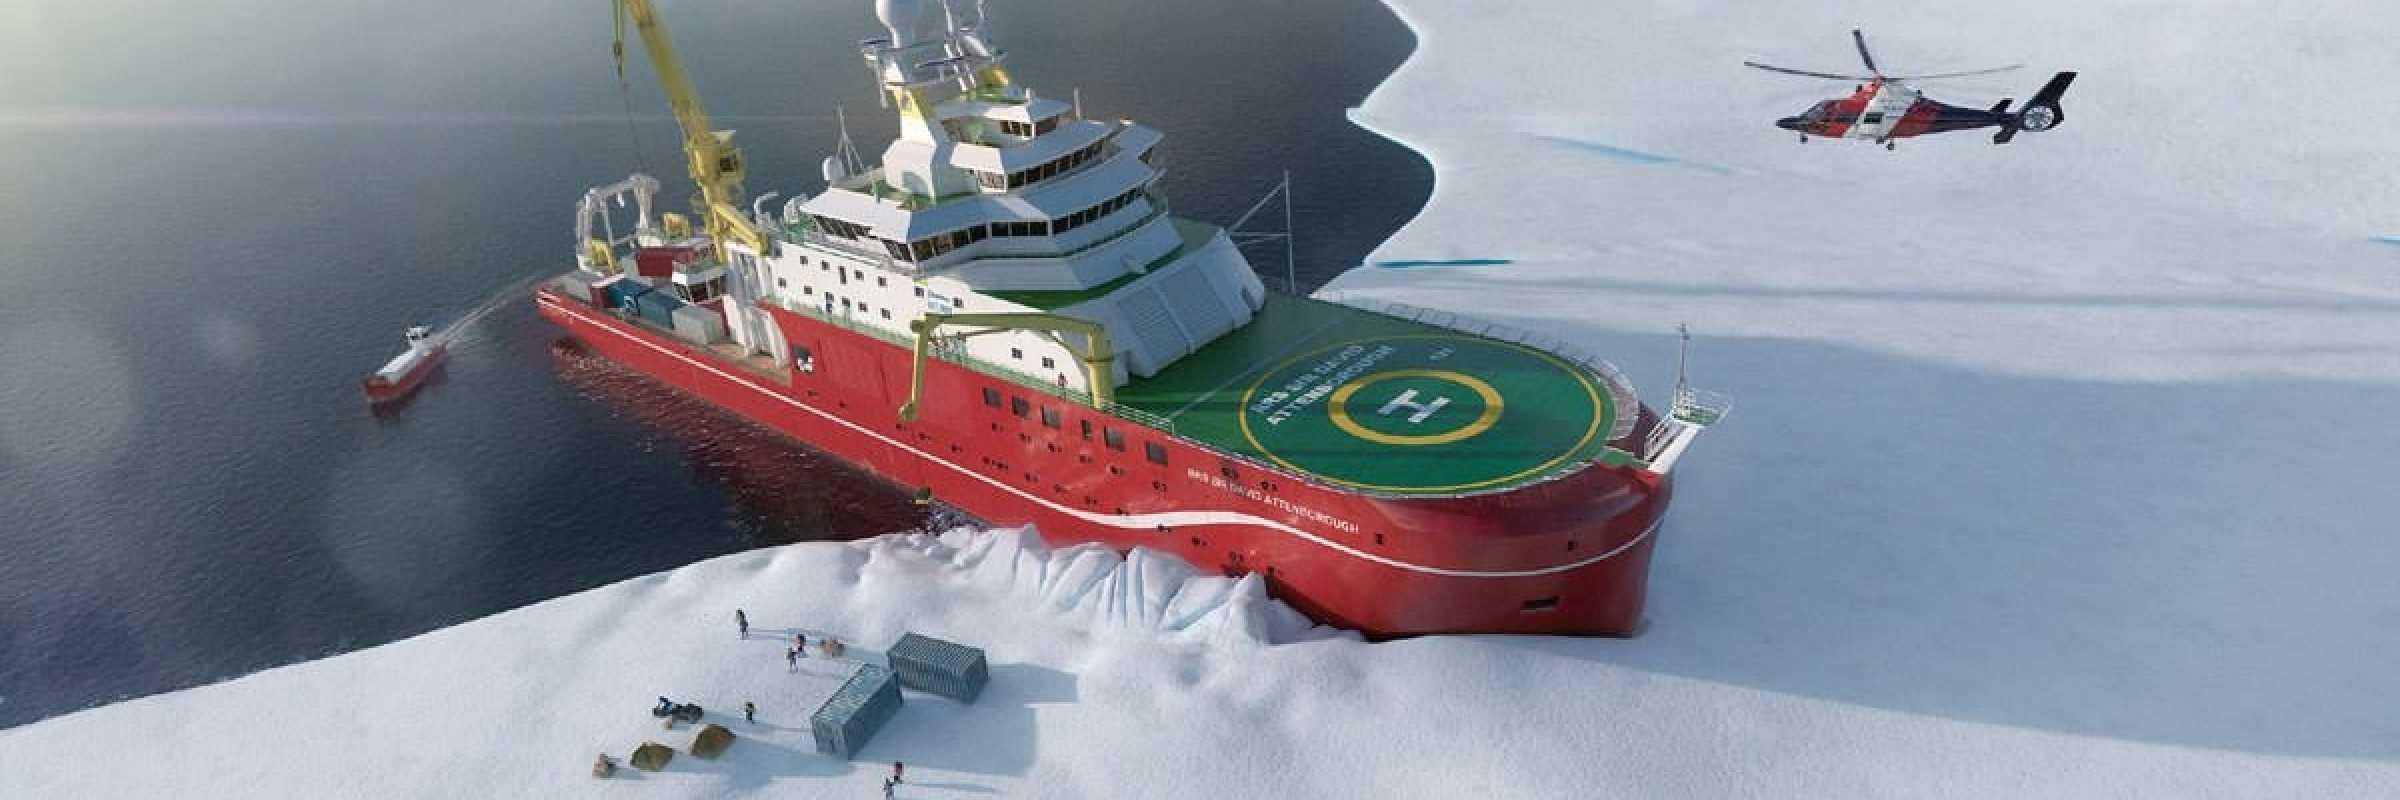 Polar Code navigation